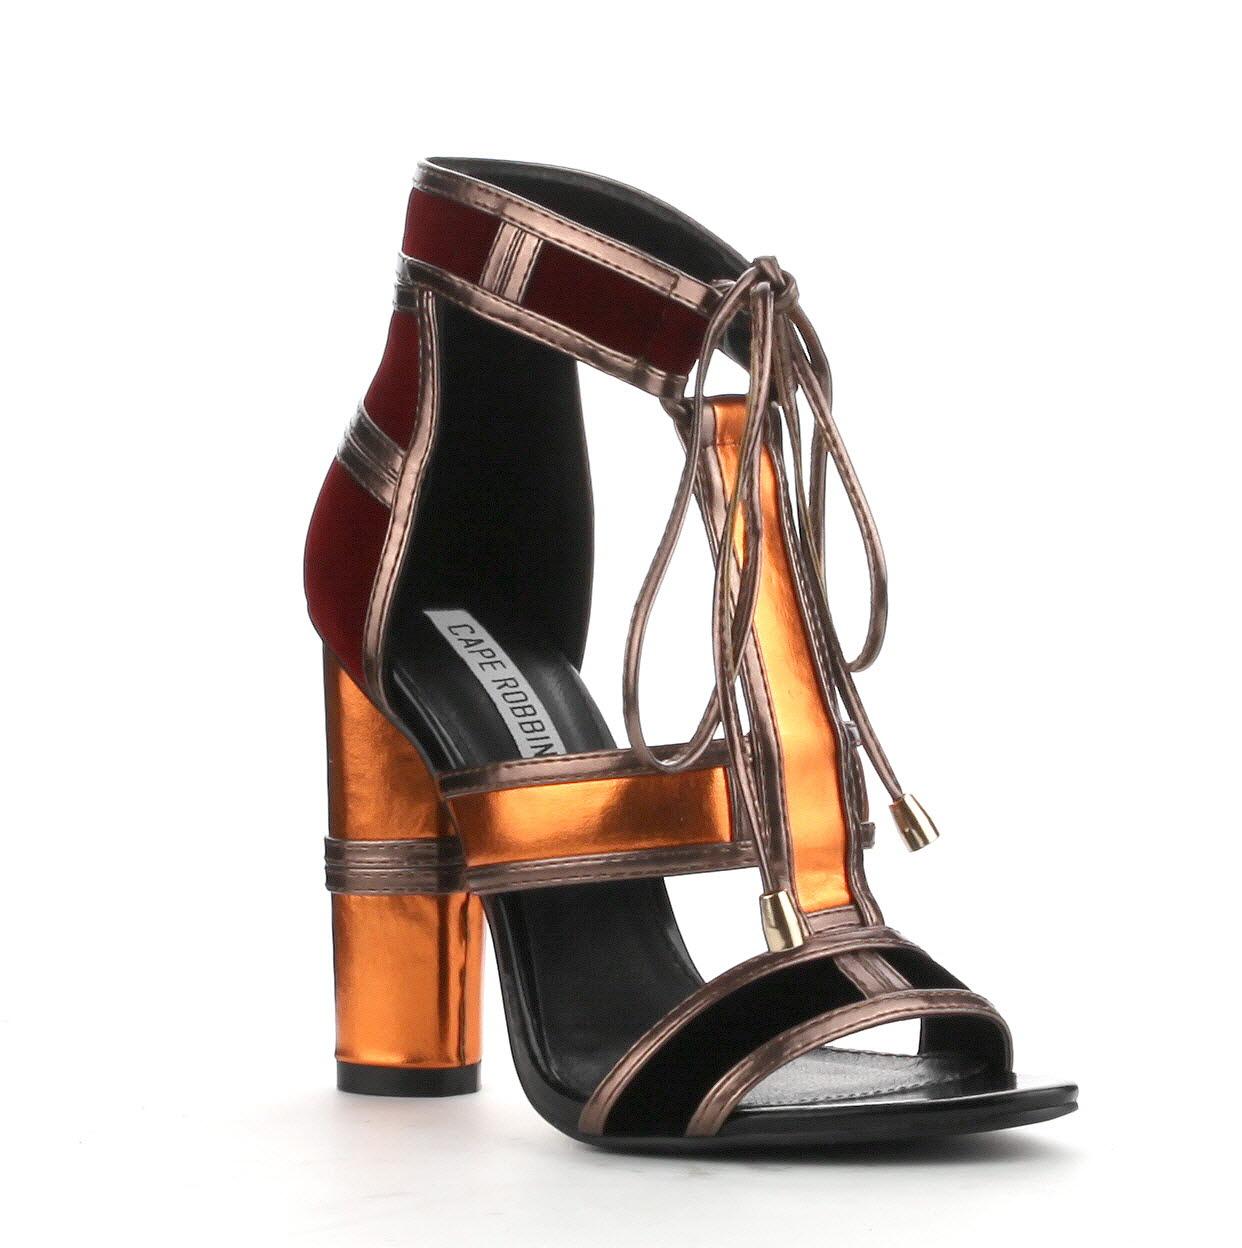 Black sandals 2 inch heel - Cape Robbin Maura 2 Orange Multi Lace Up